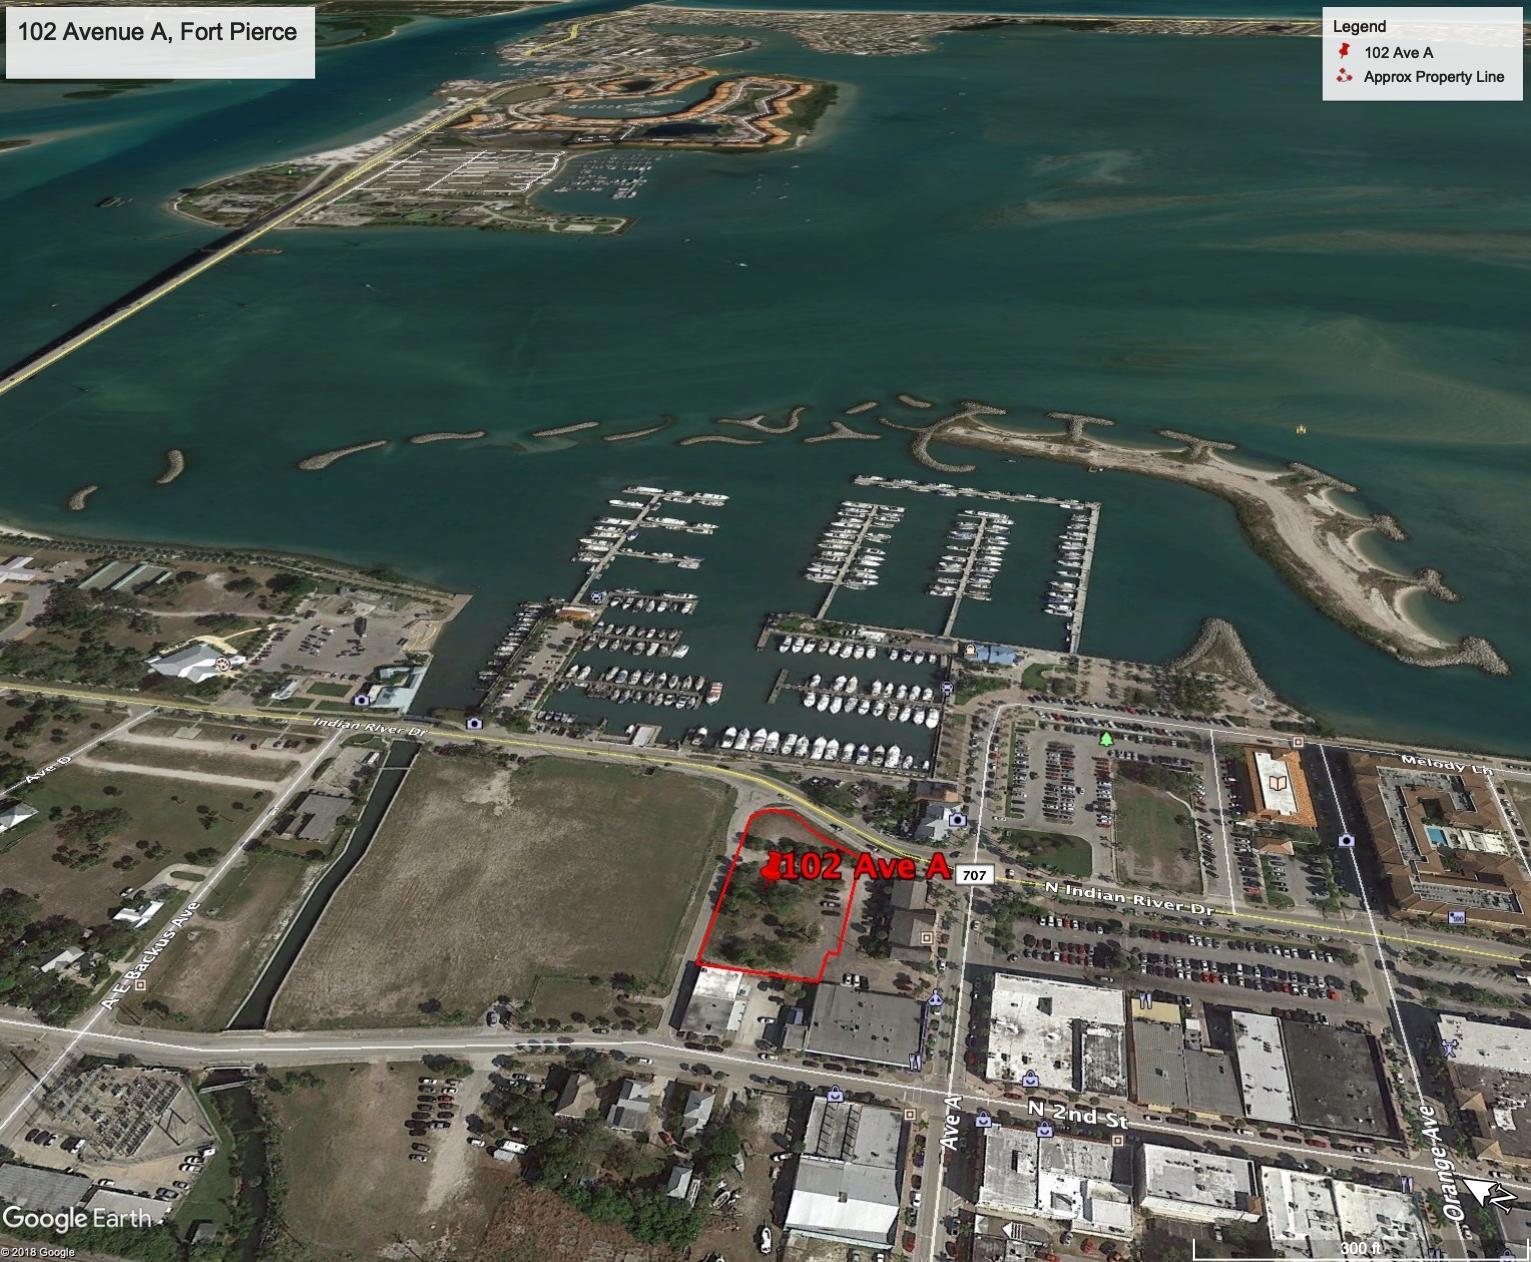 102 Avenue A, Fort Pierce, FL 34950